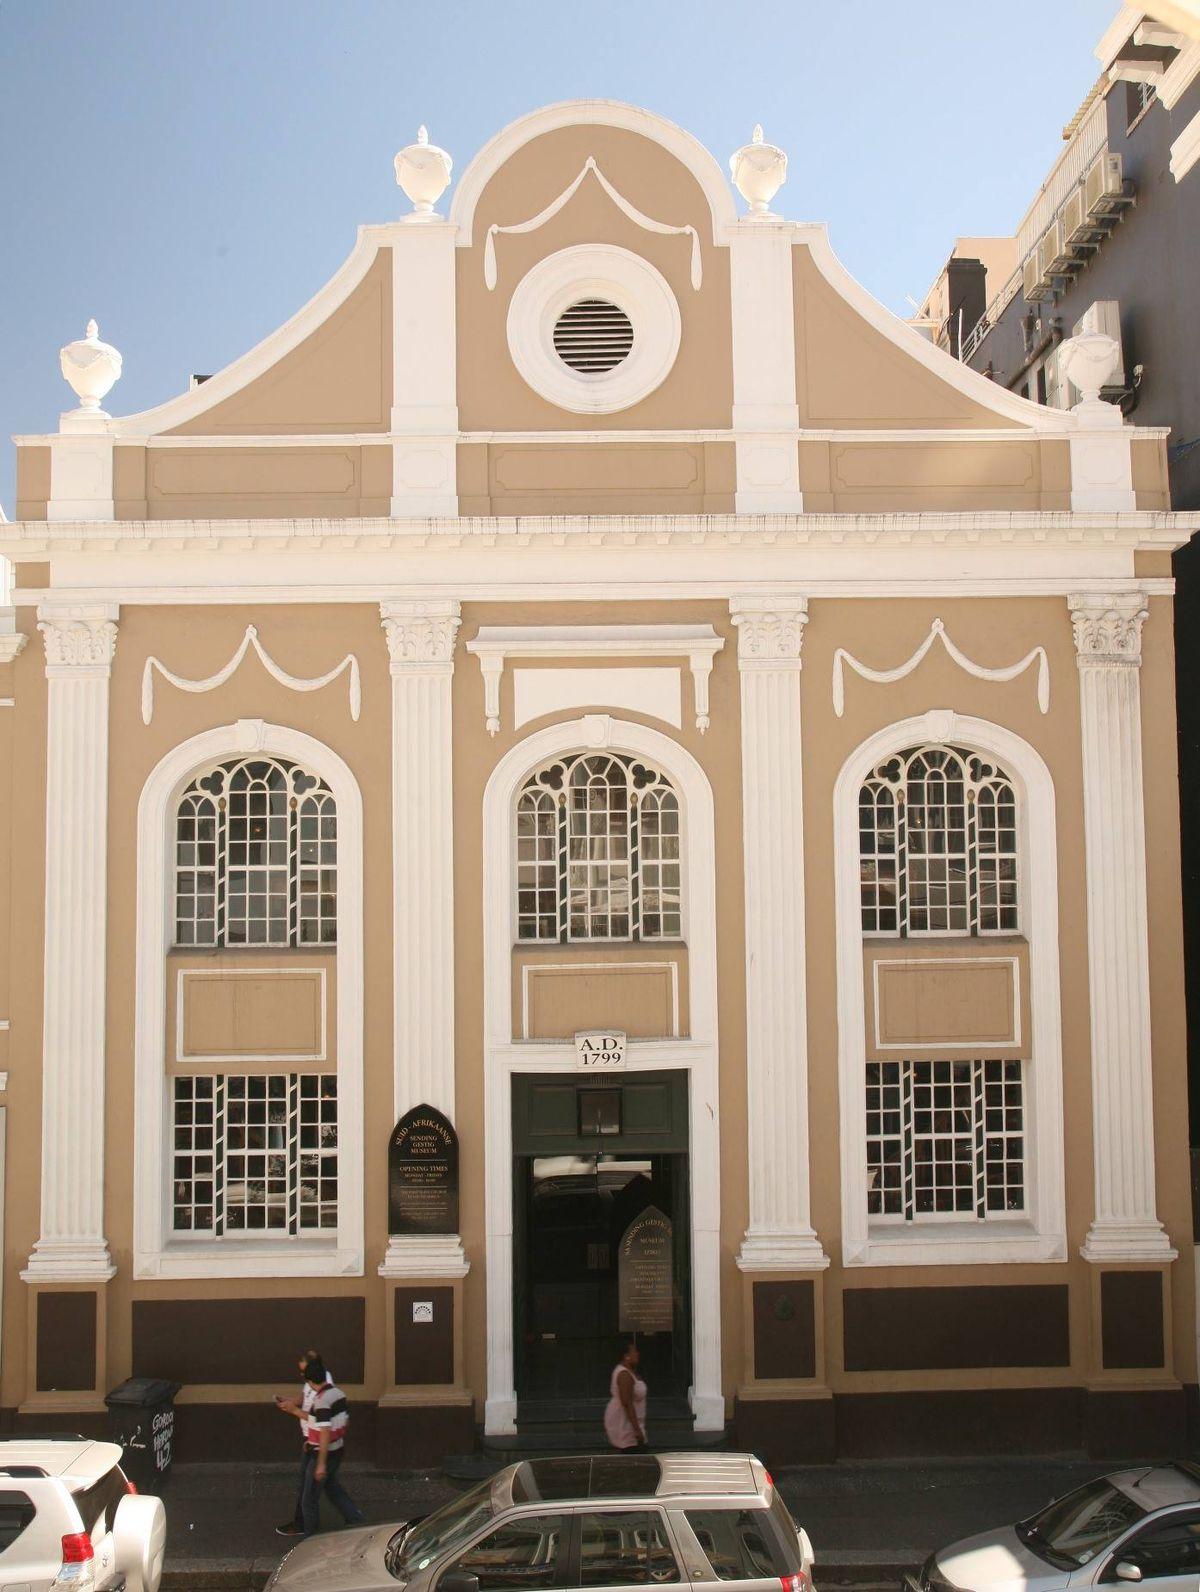 South African Sendinggestig Museum Wikipedia